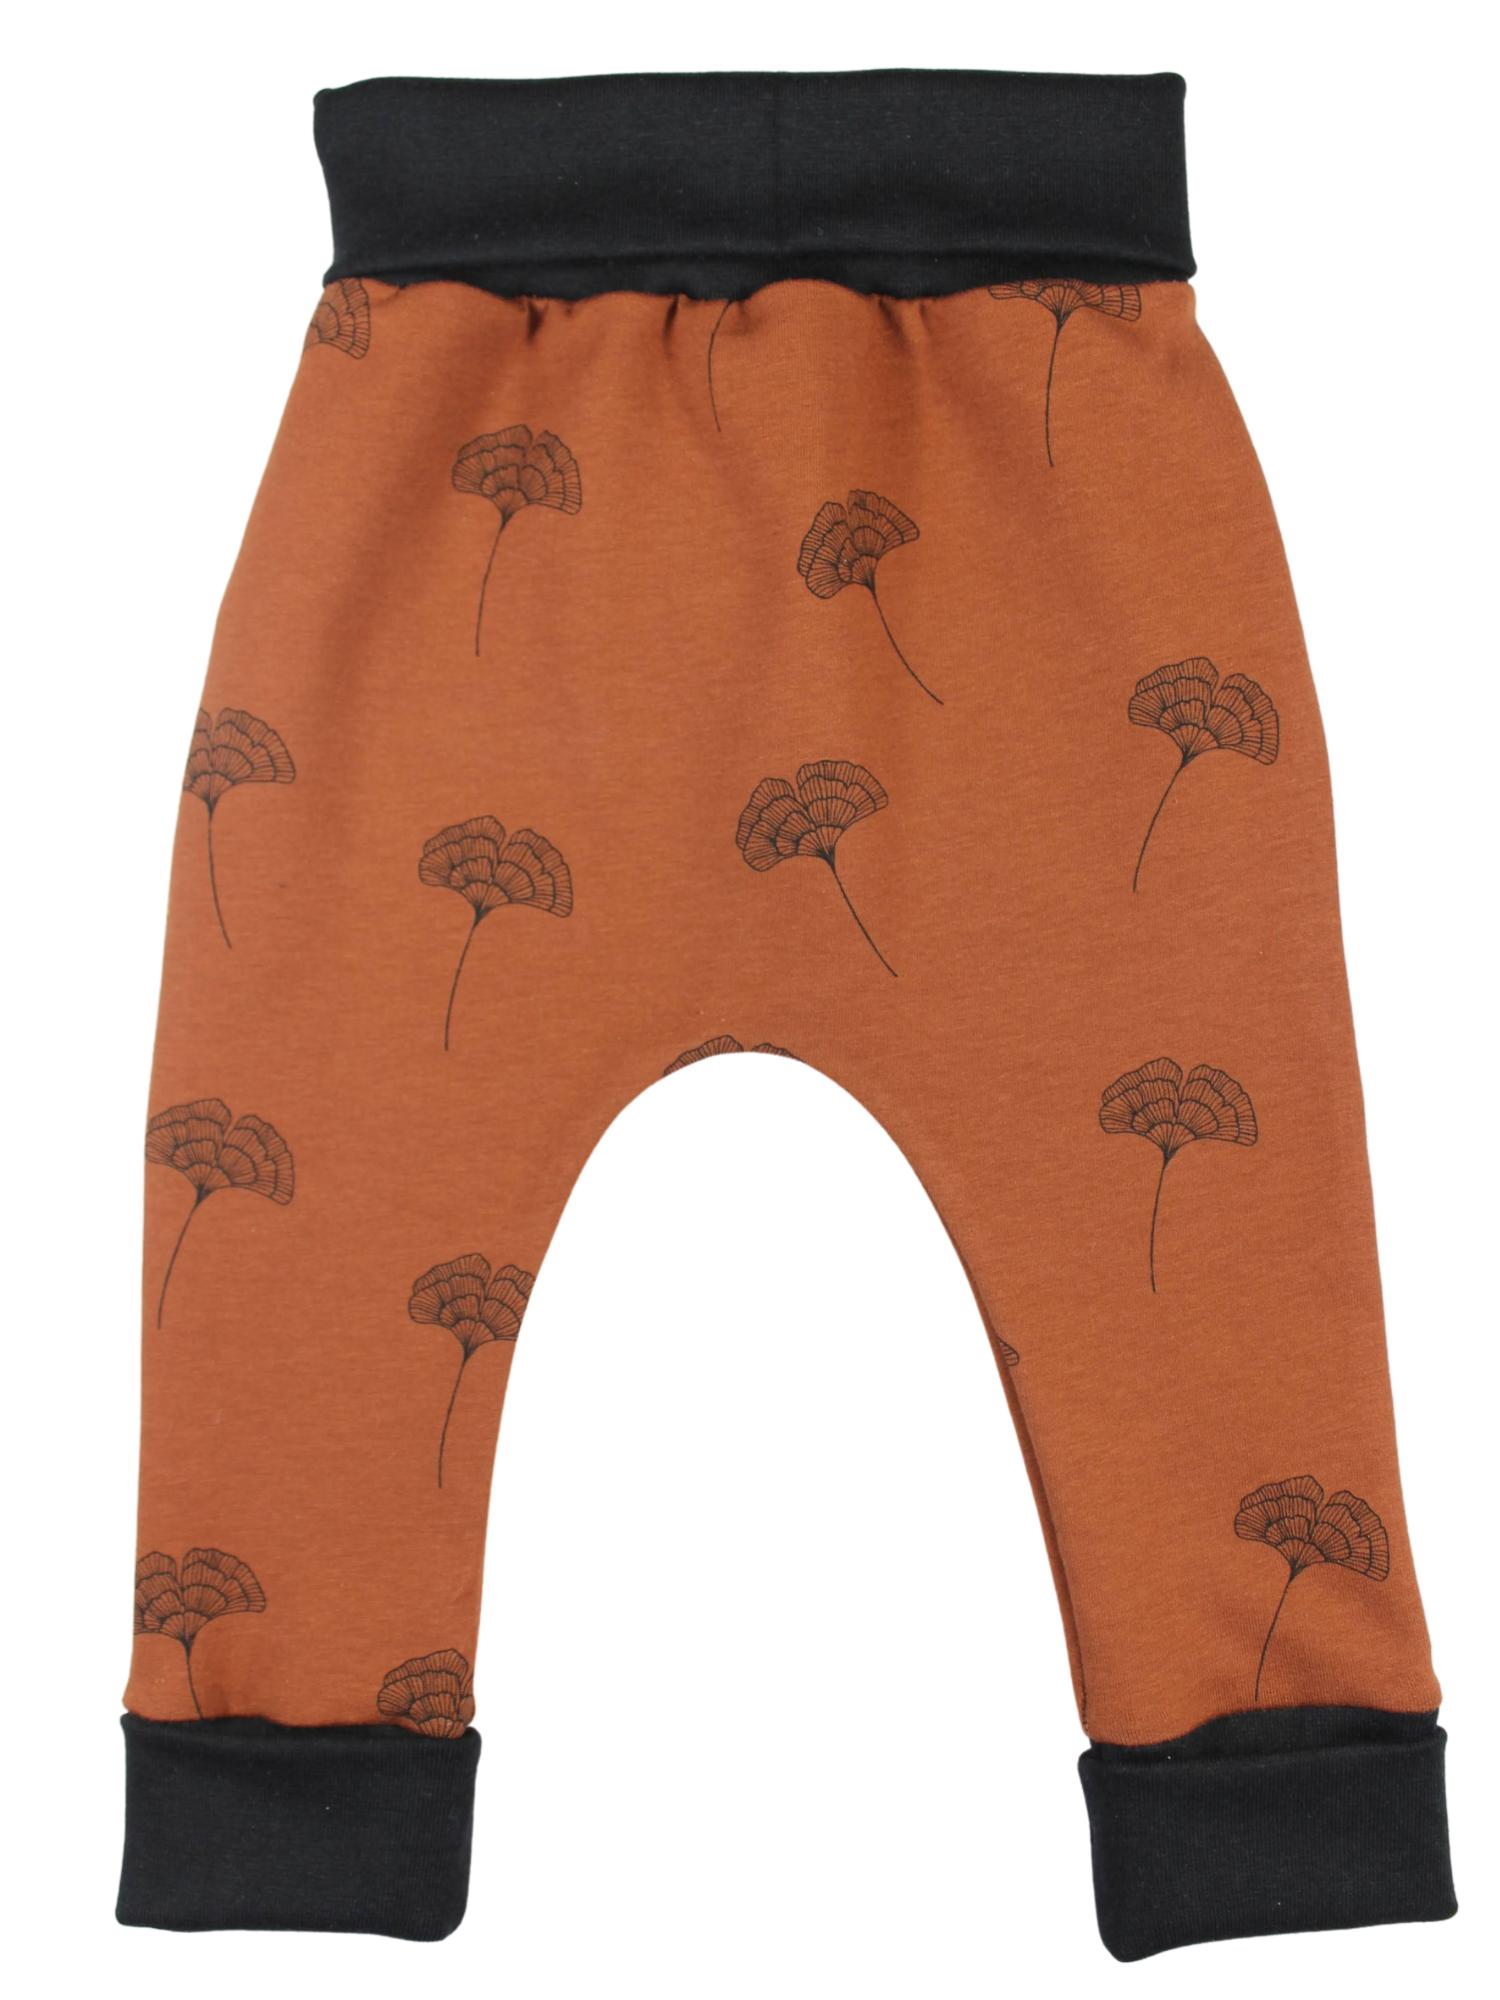 Pantalon évolutif - GINKGO